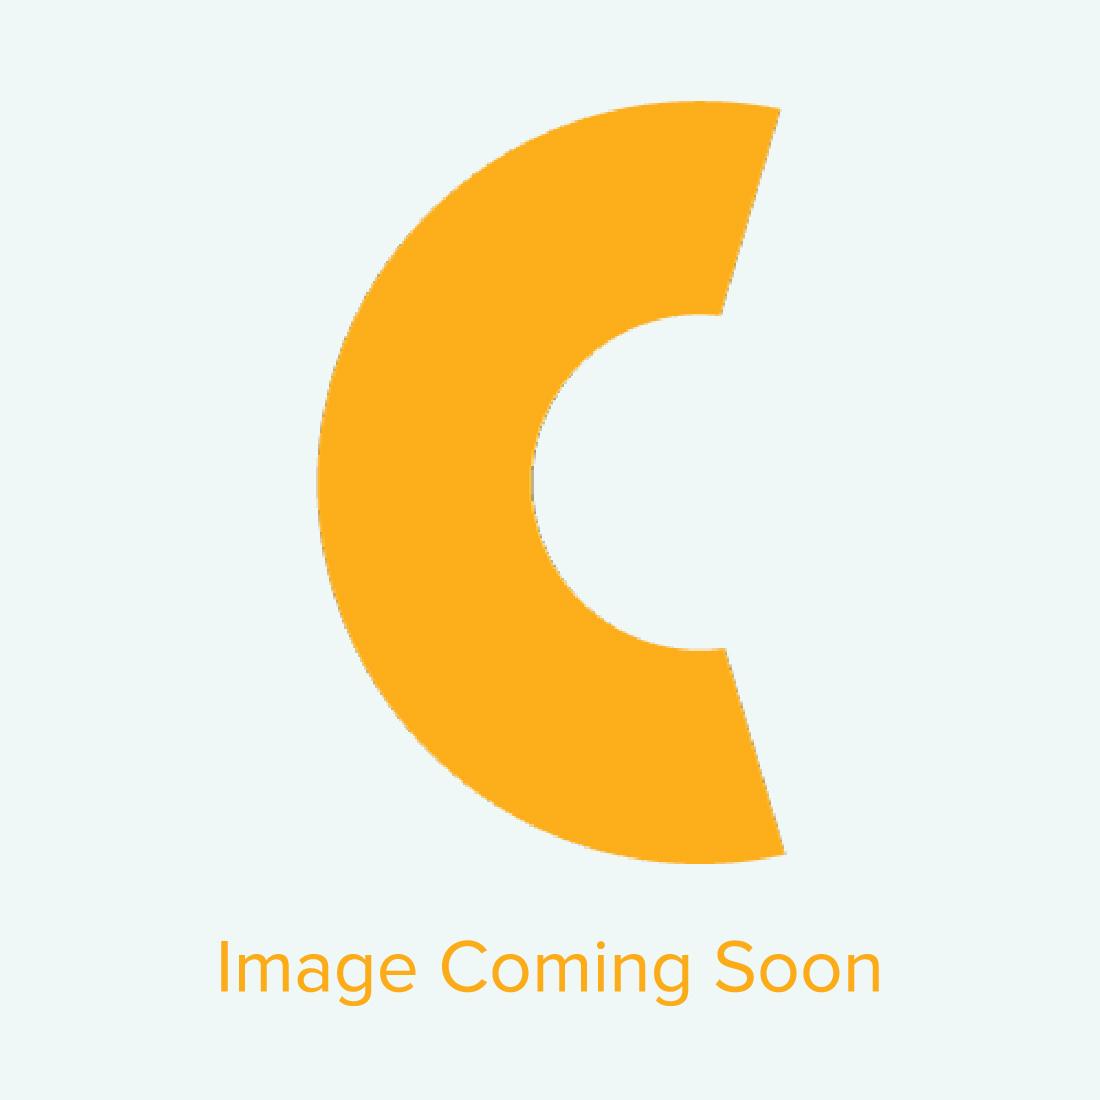 "Epson SureColor F6370 44"" Wide Format Dye Sublimation Printer (Production Edition)"